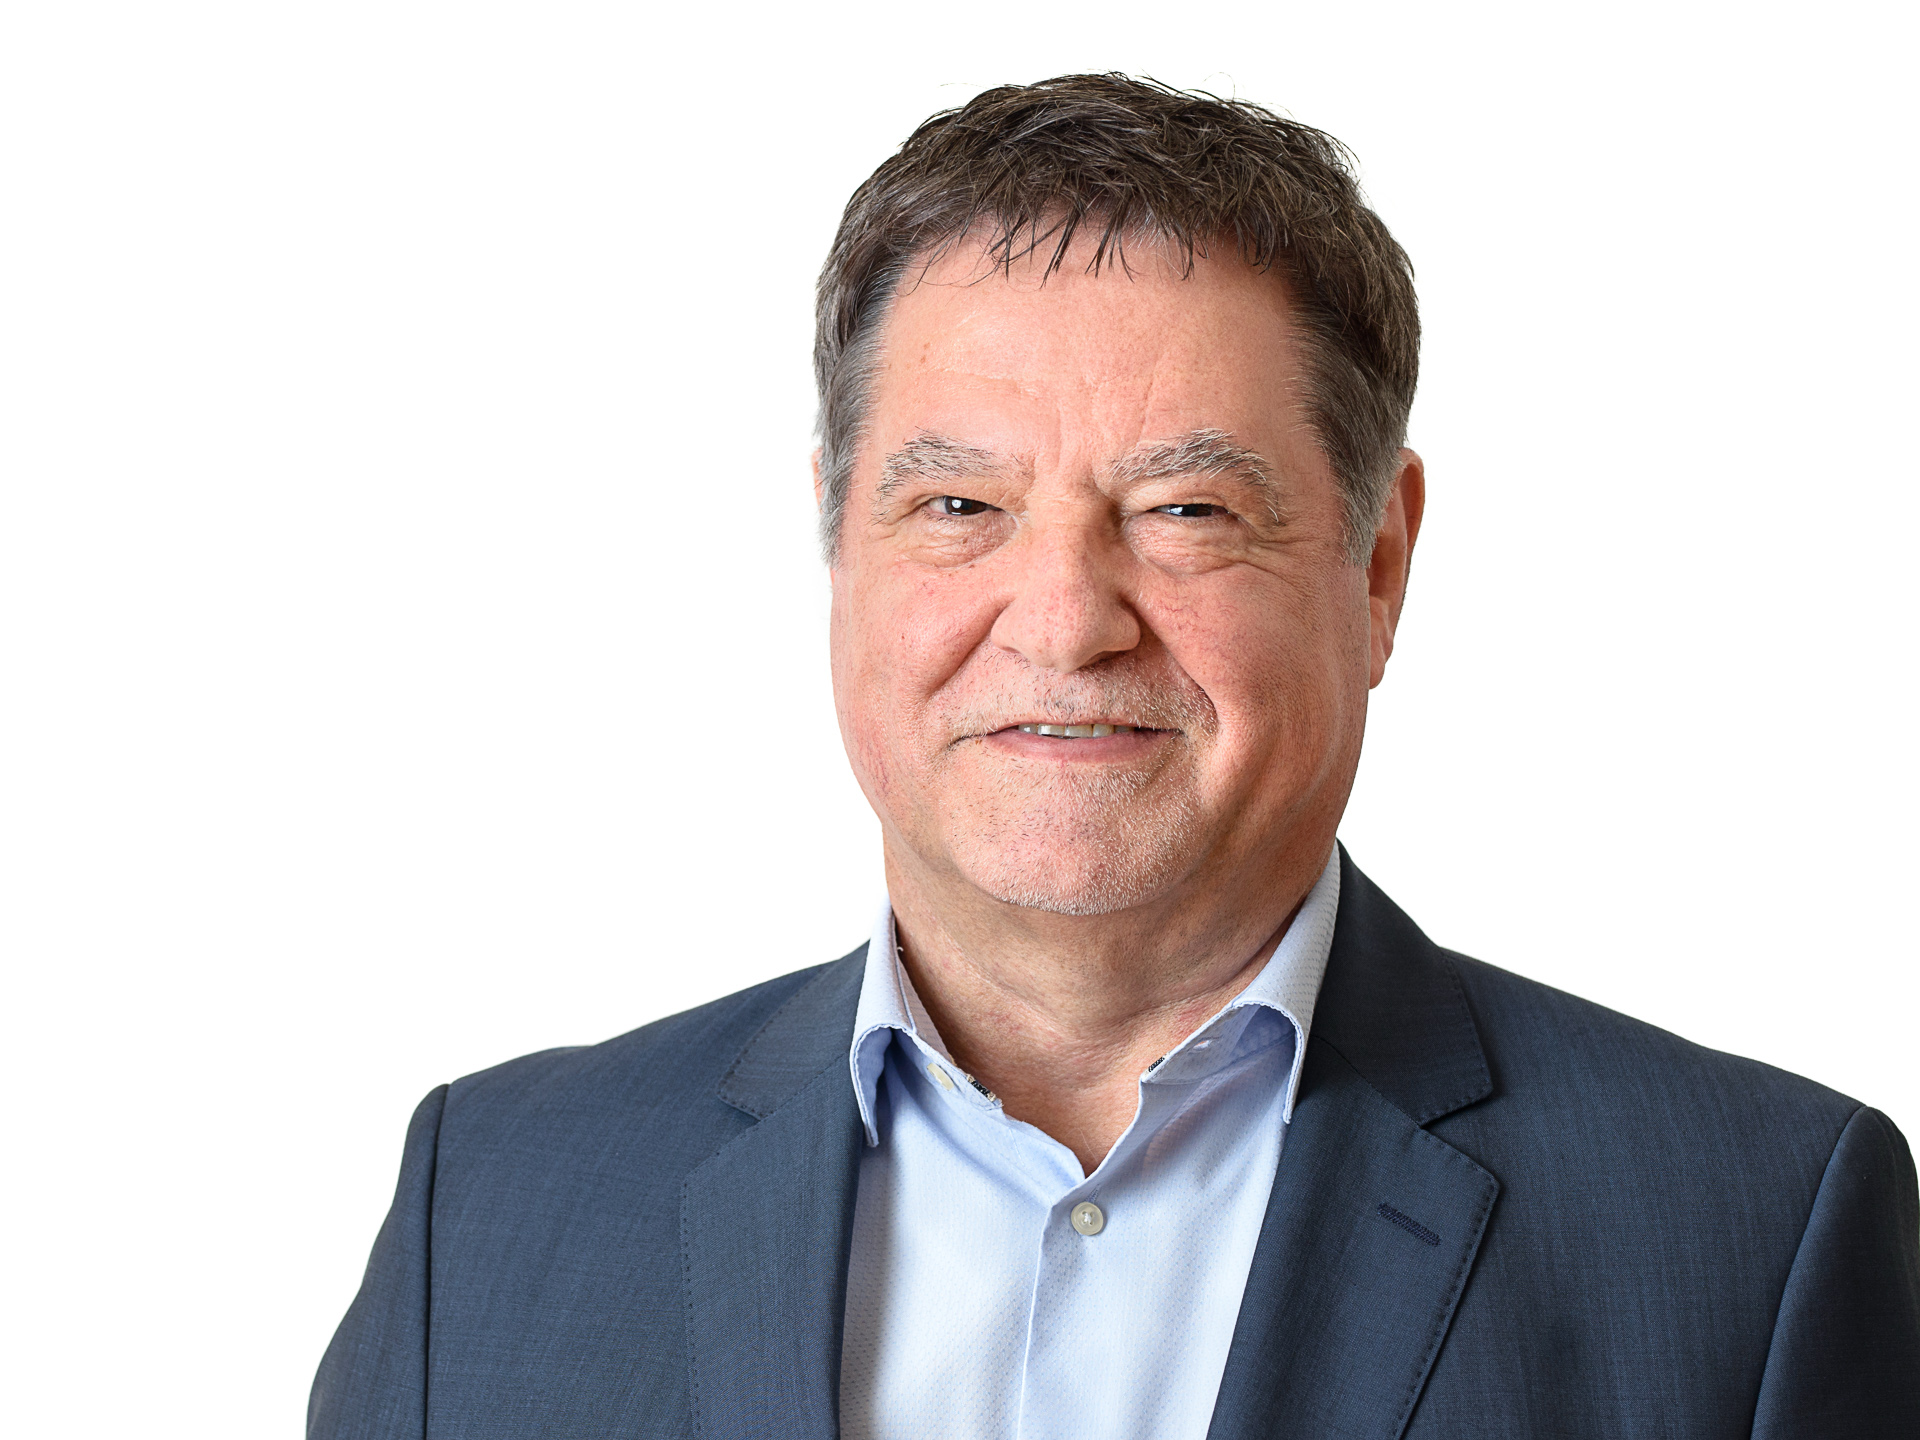 Bernhard Metzger